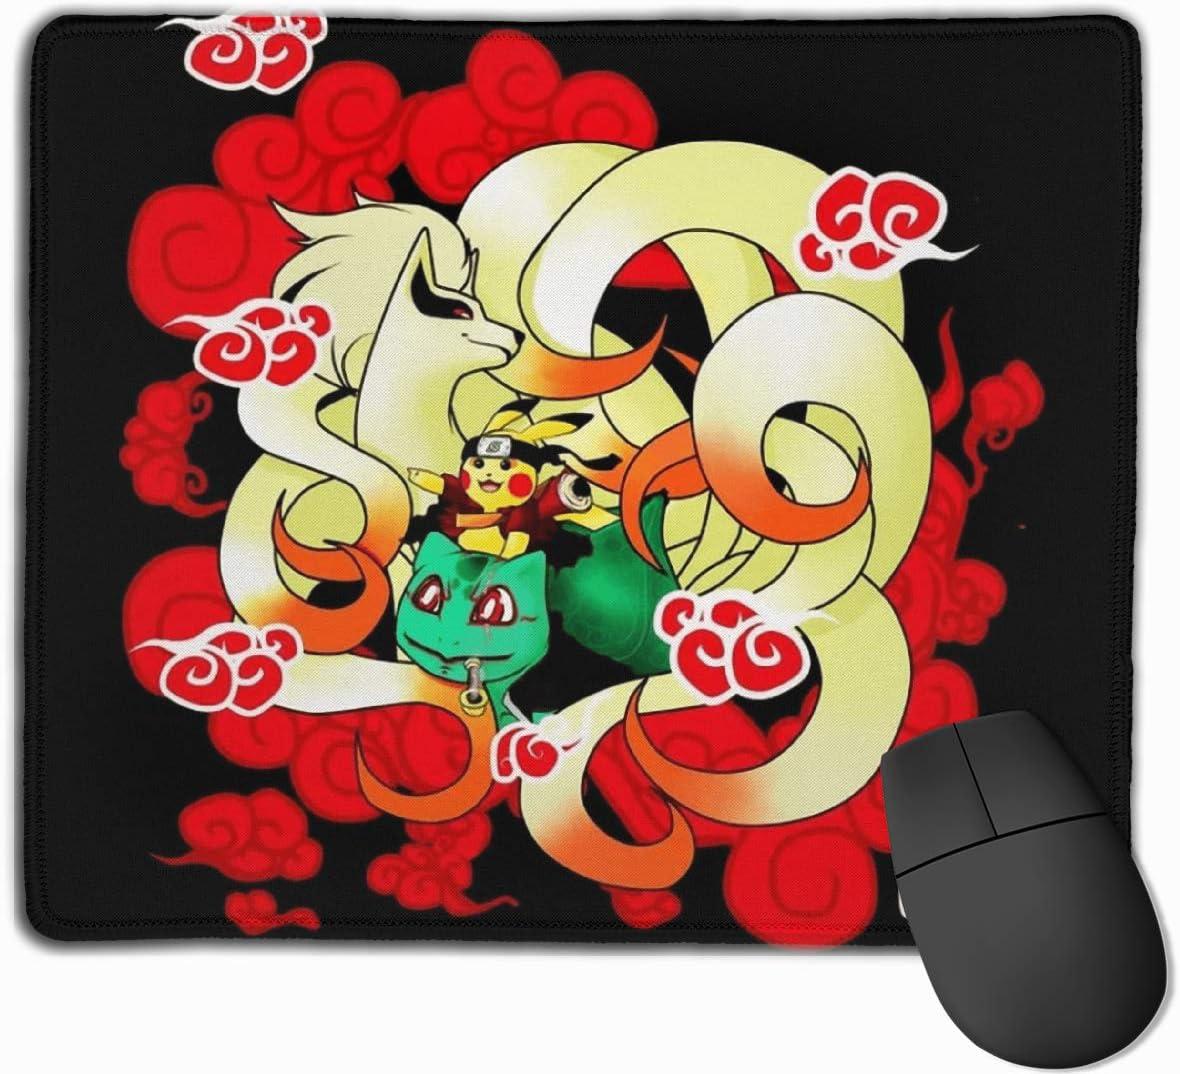 DAIPLY My Hero Academia Deku Profile Computer Laptop Mousepad Stitched Edge Gaming Mouse Pad 11.8x9.8